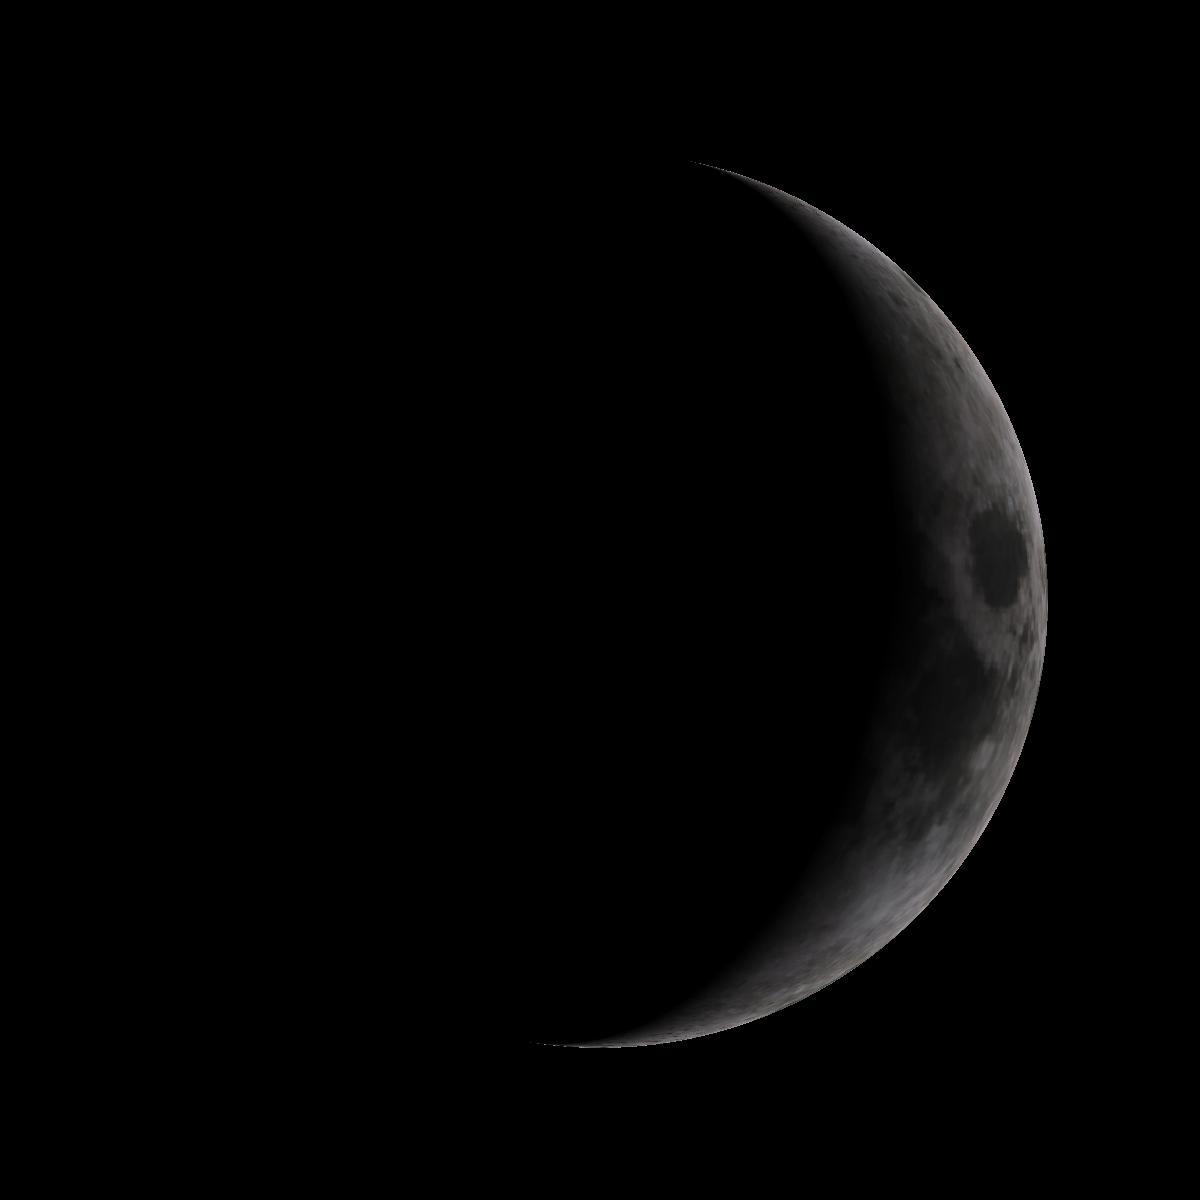 Lune du 29 mars 2020